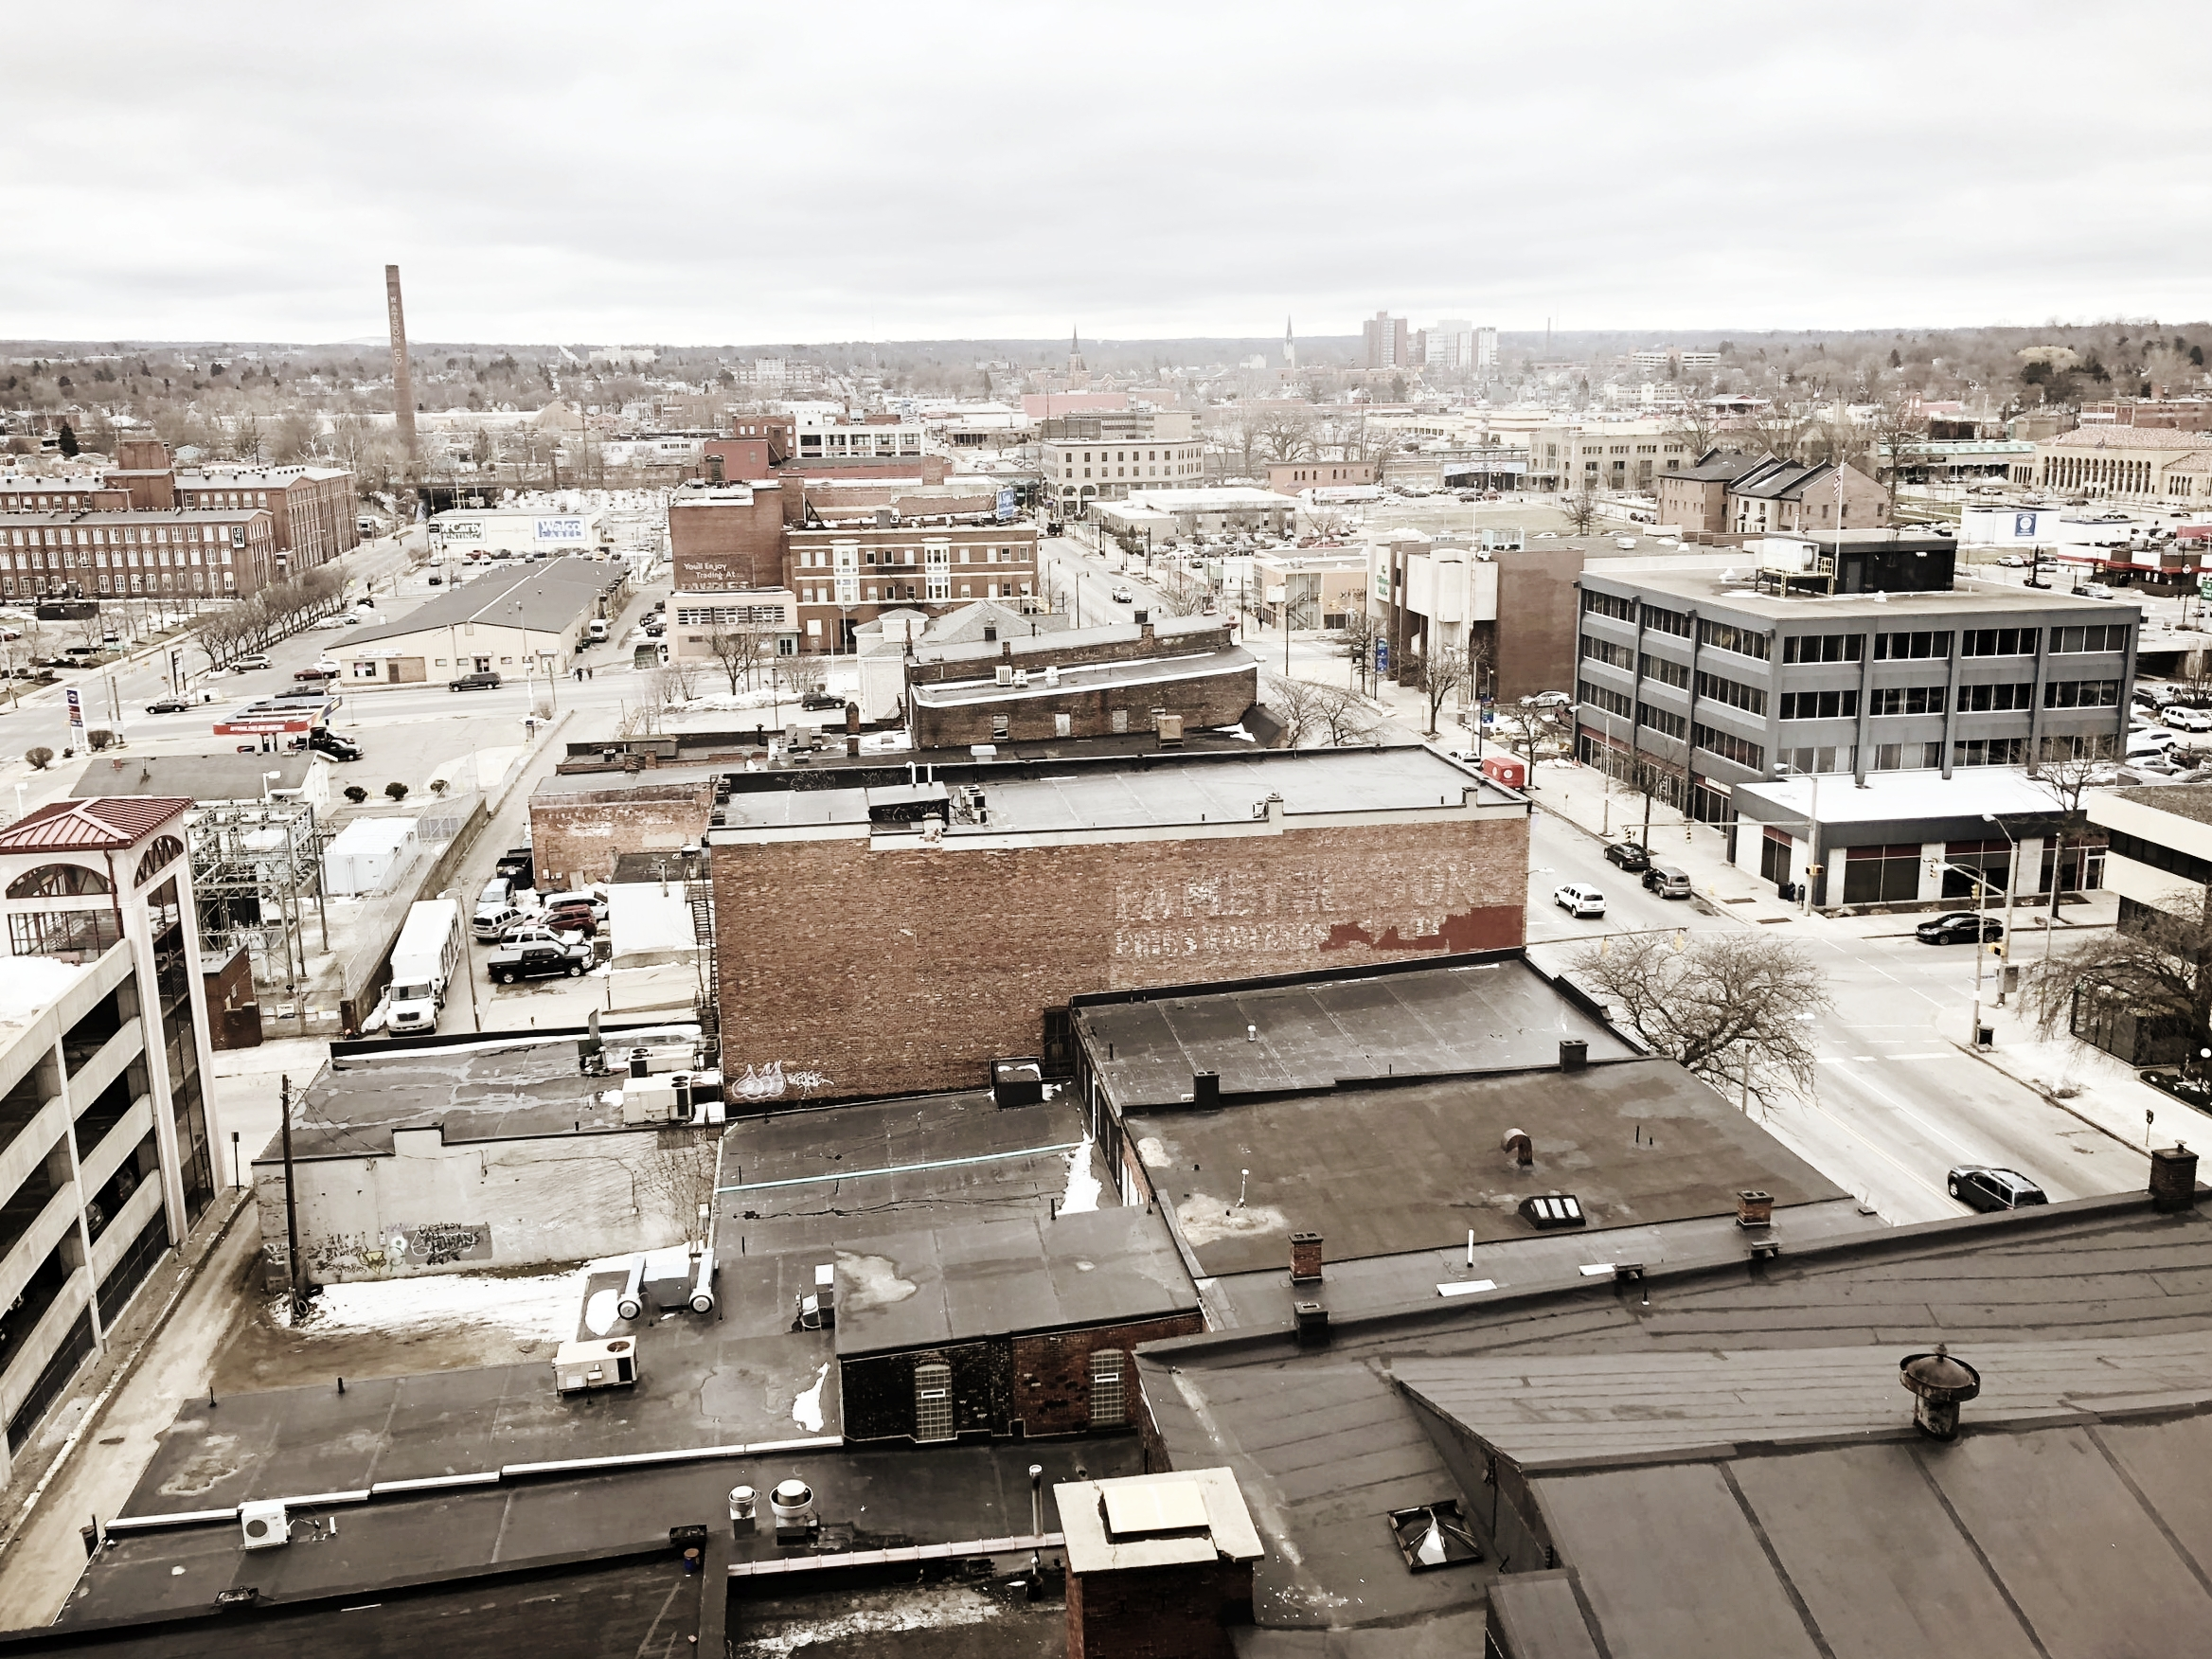 Erie, Pennsylvania